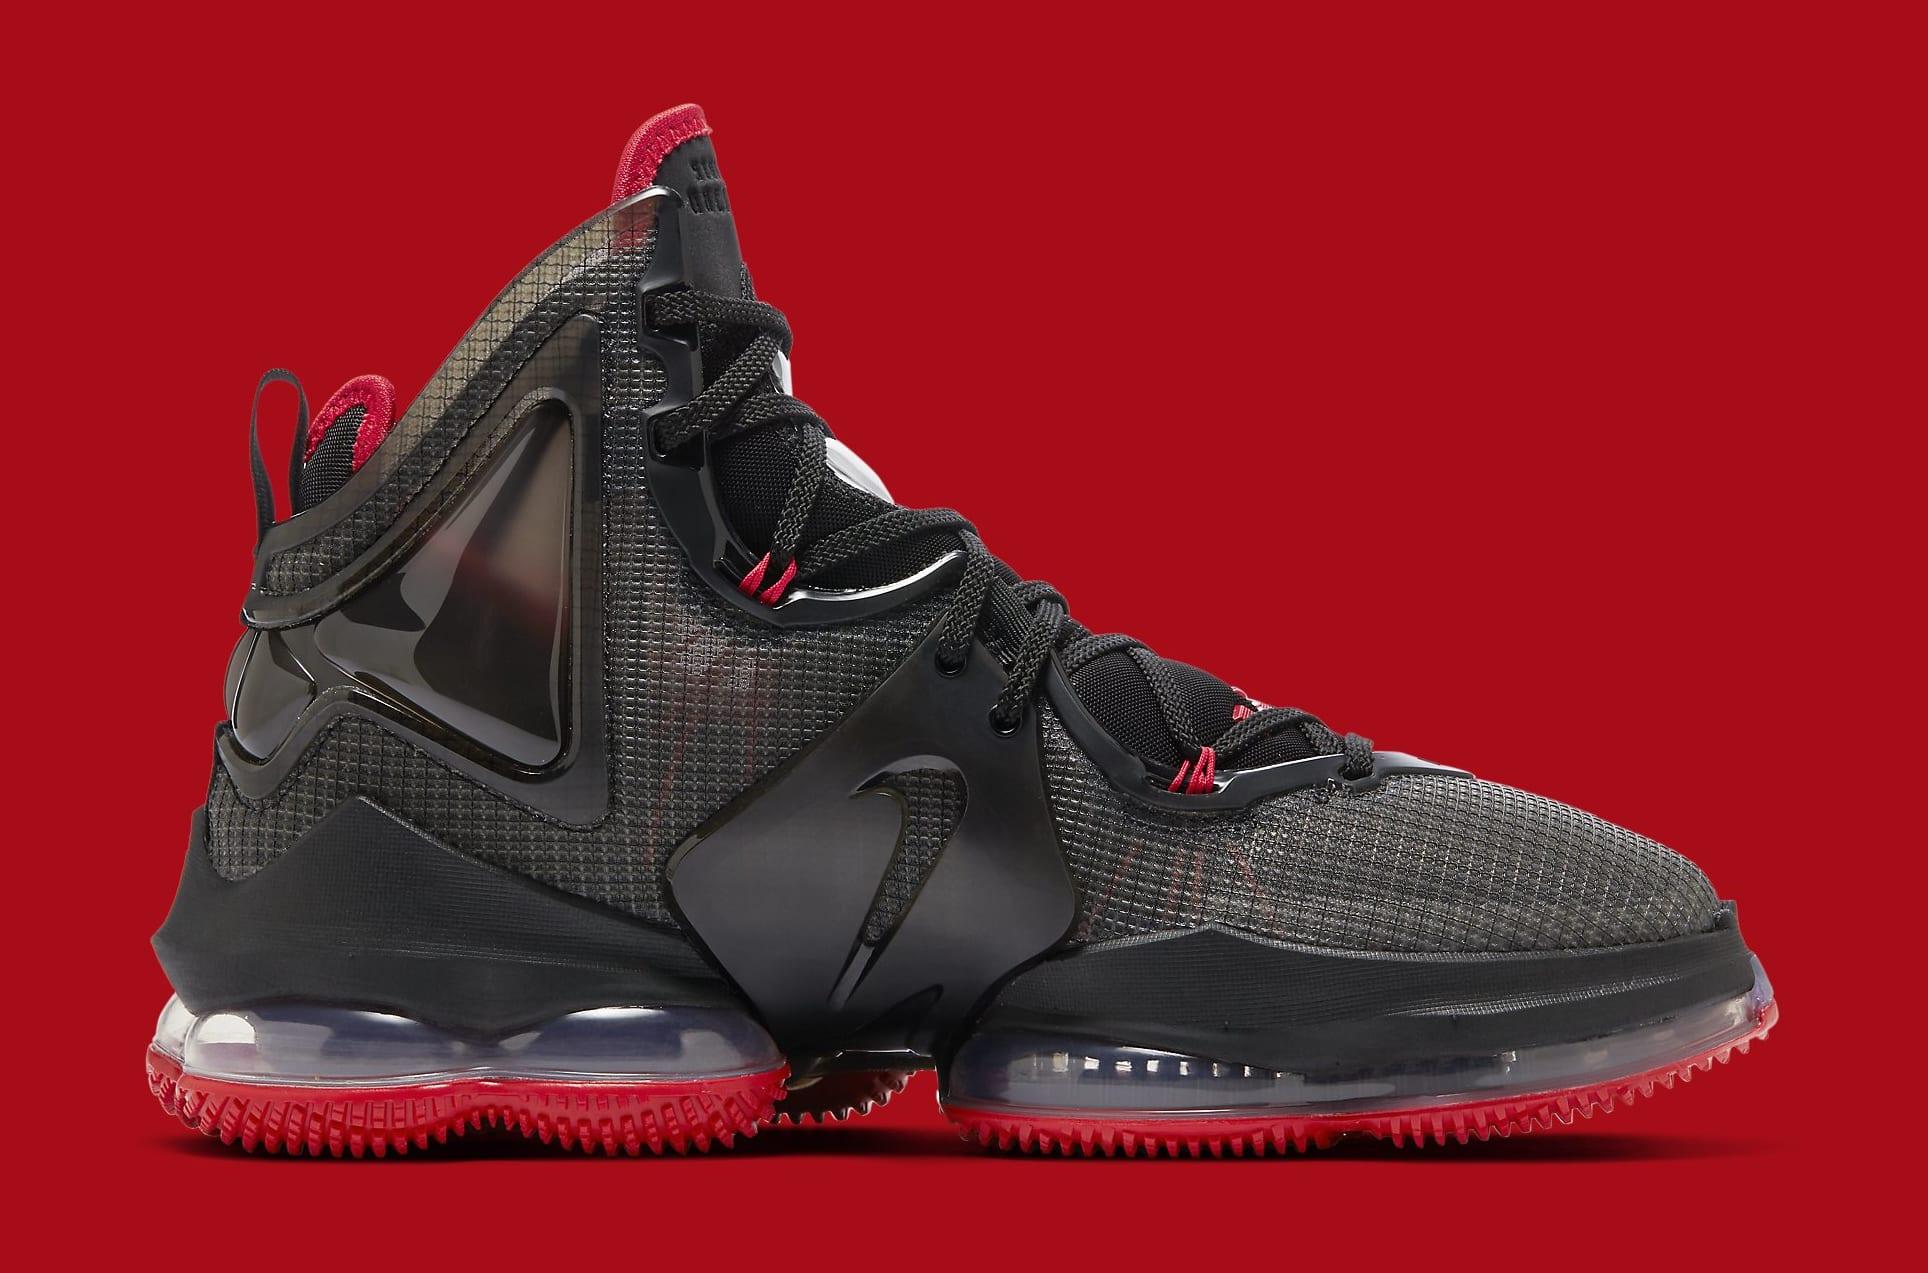 Nike LeBron 19 'Black/Red' DC9340-001 Medial